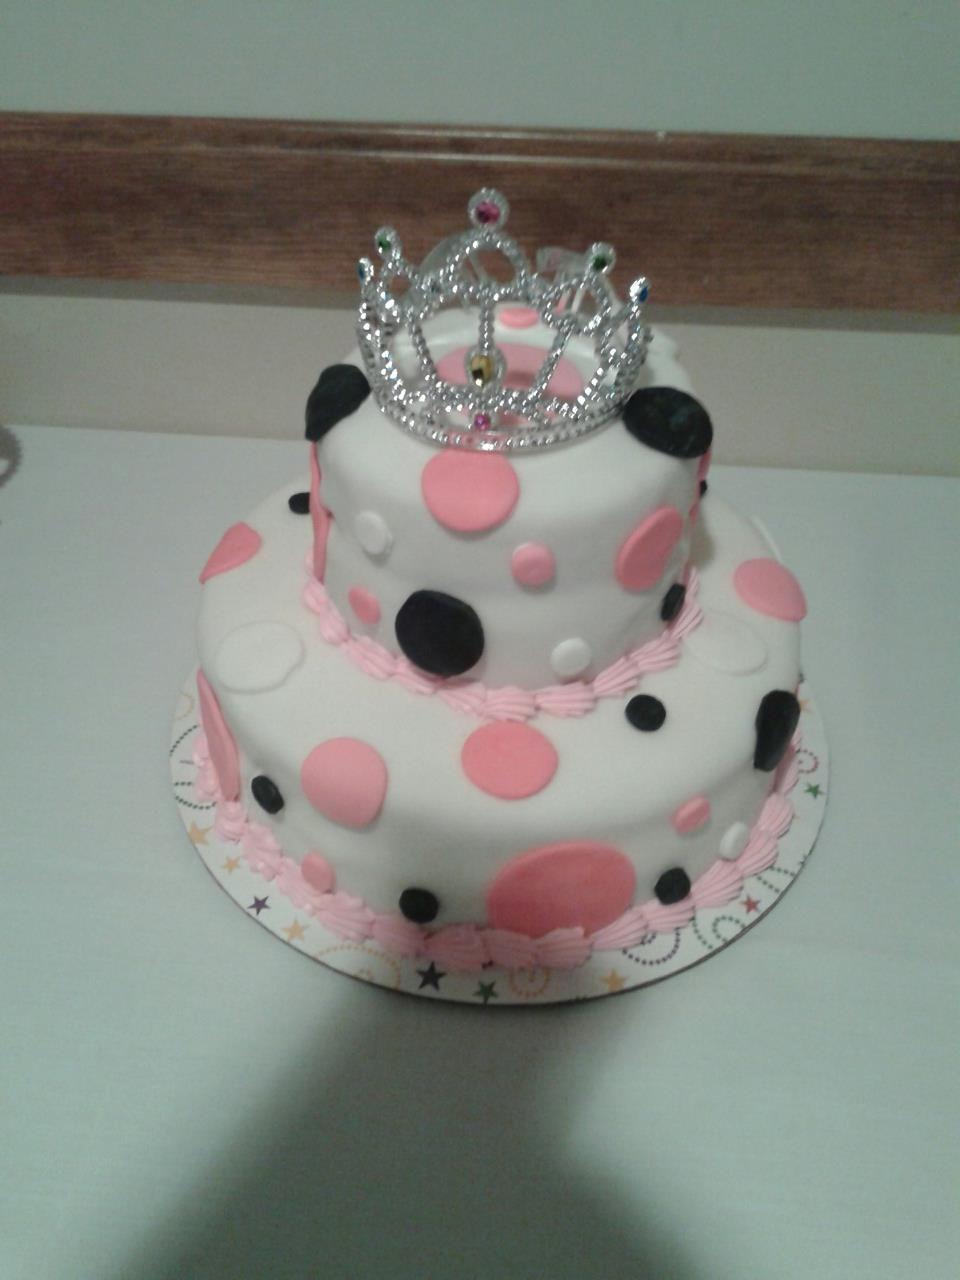 Melissas 2 tier rolled fondant cake cakes Pinterest